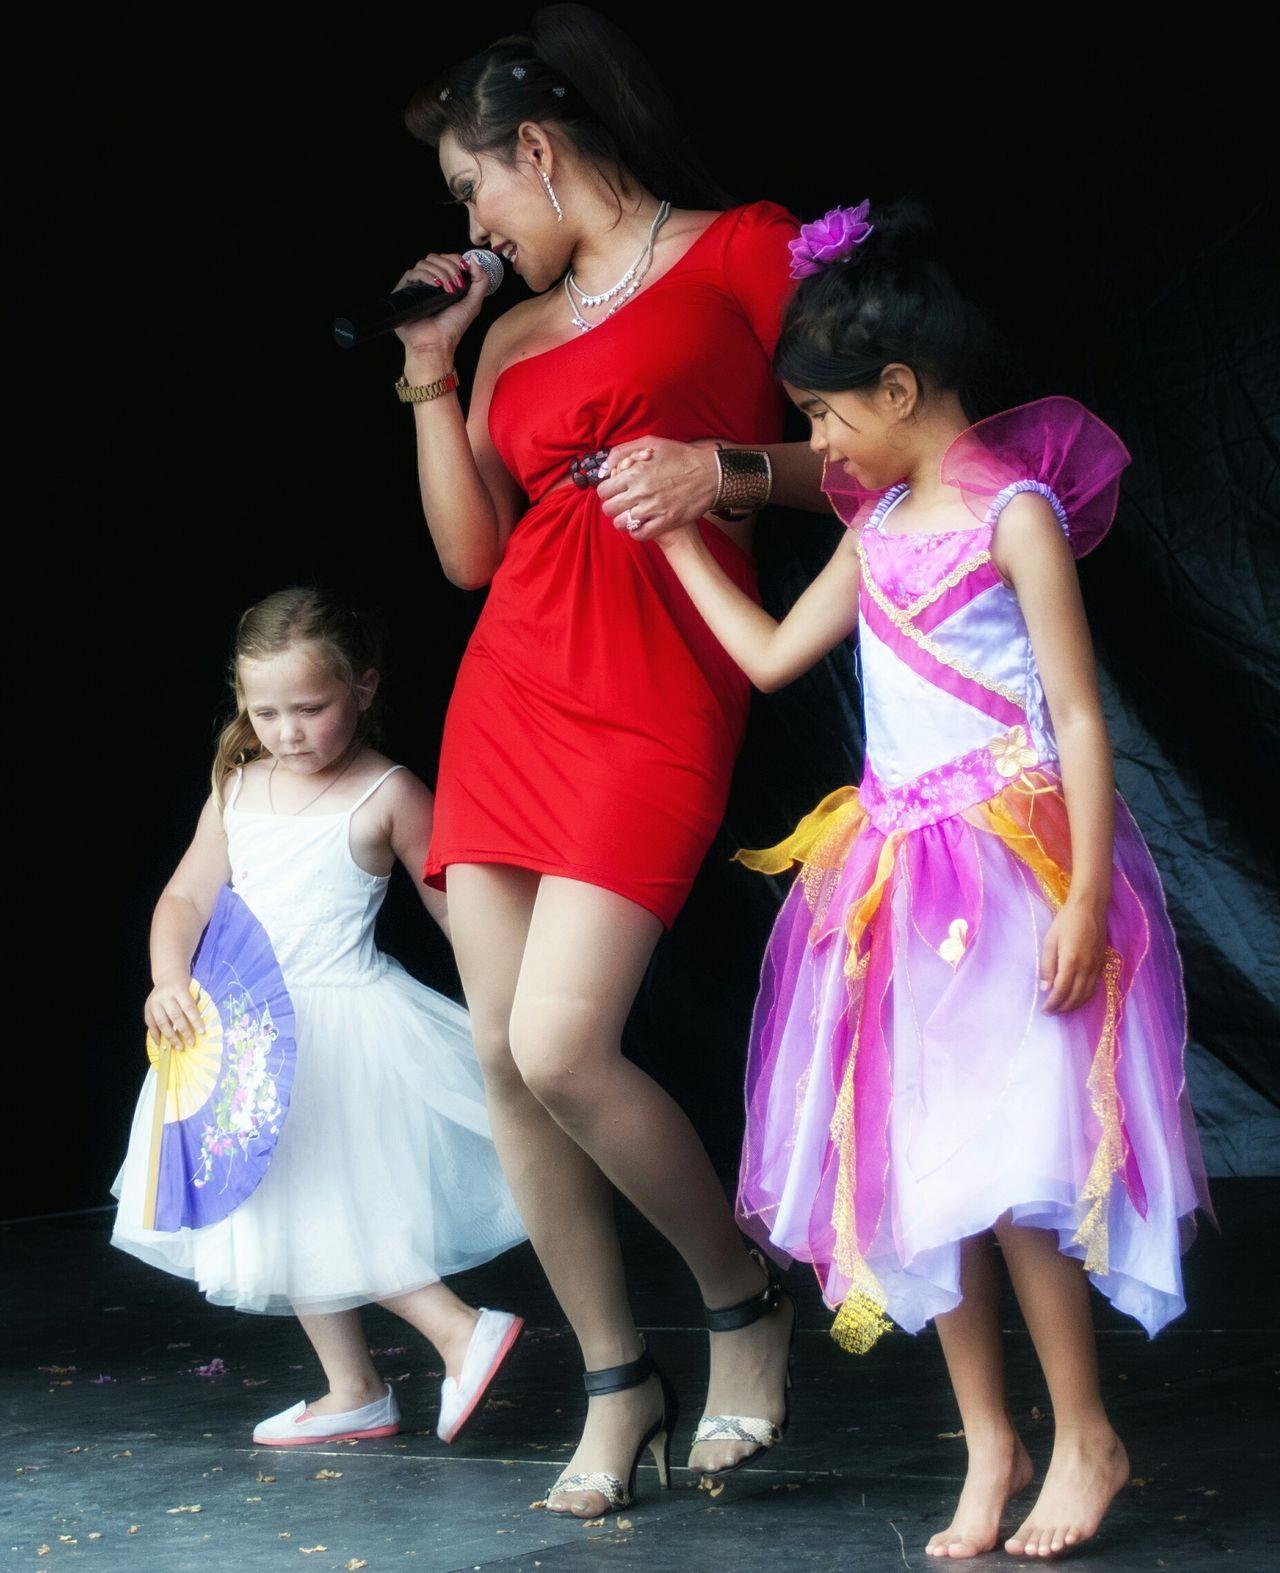 Southsea Thai Dance ❤ Dancing :)  Nikonphotography Nikon DANCE ♥ Stage Photography Thai Girl